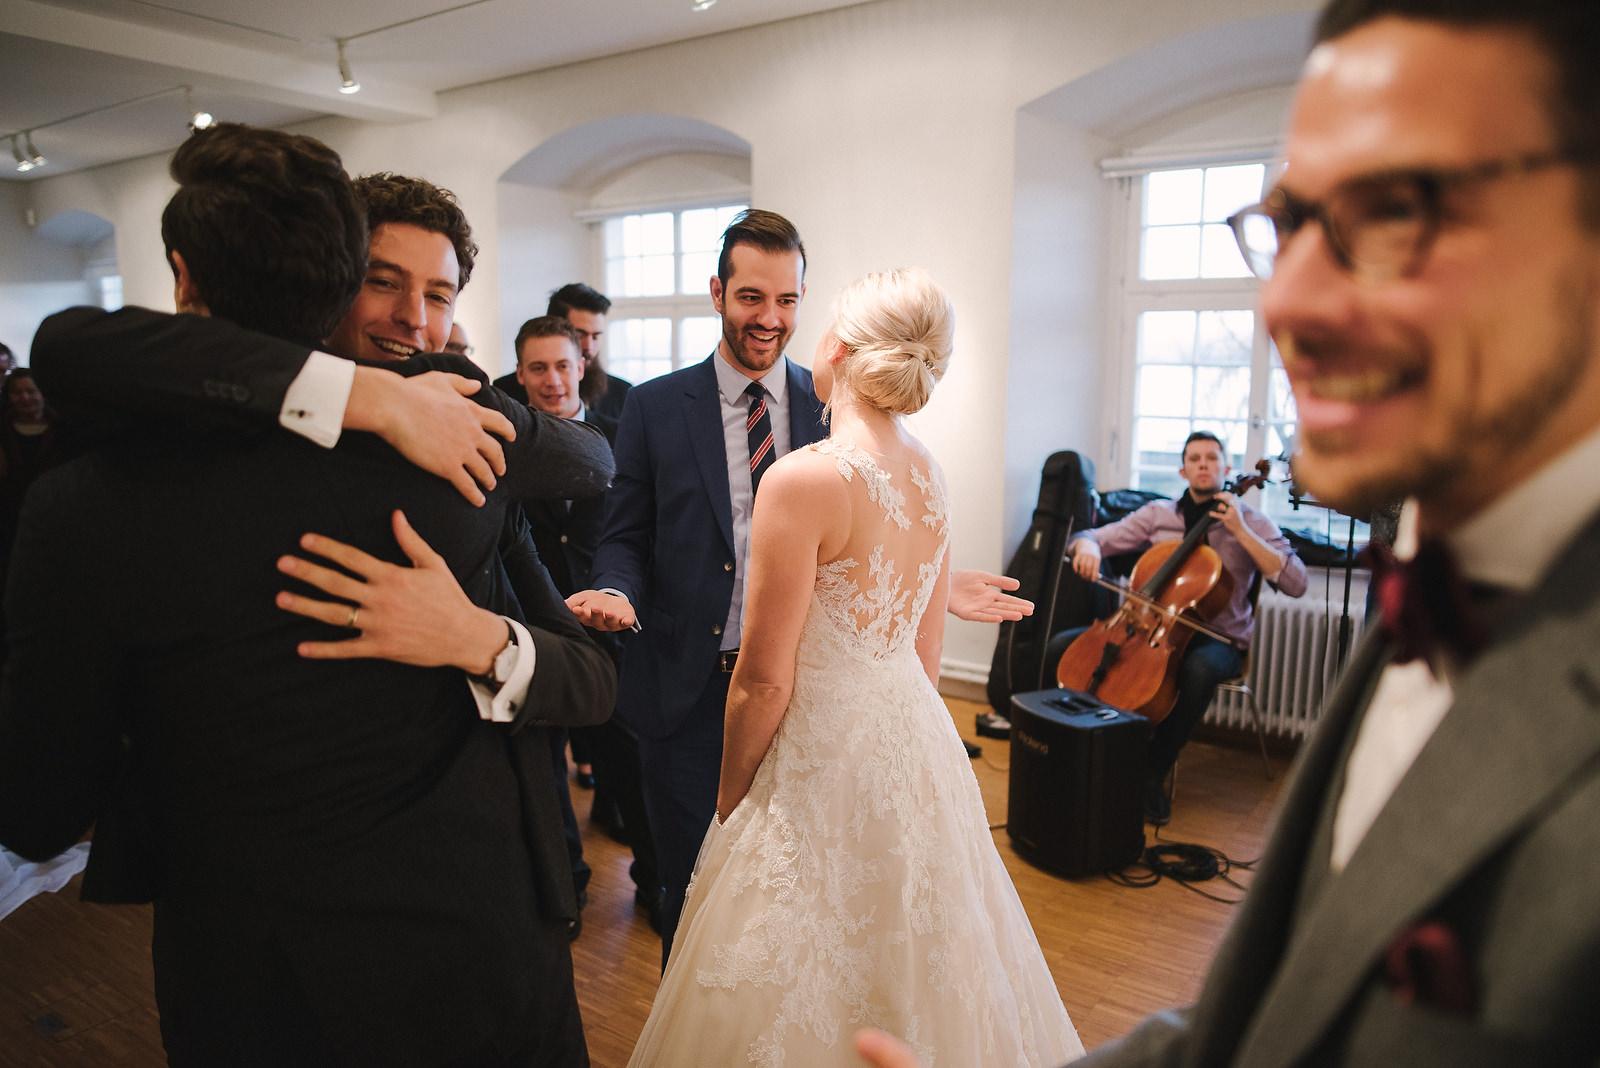 Fotograf Konstanz - Silvester Wedding in Hagnau / Friedrichshafen at Lake of Constance  - 29 -